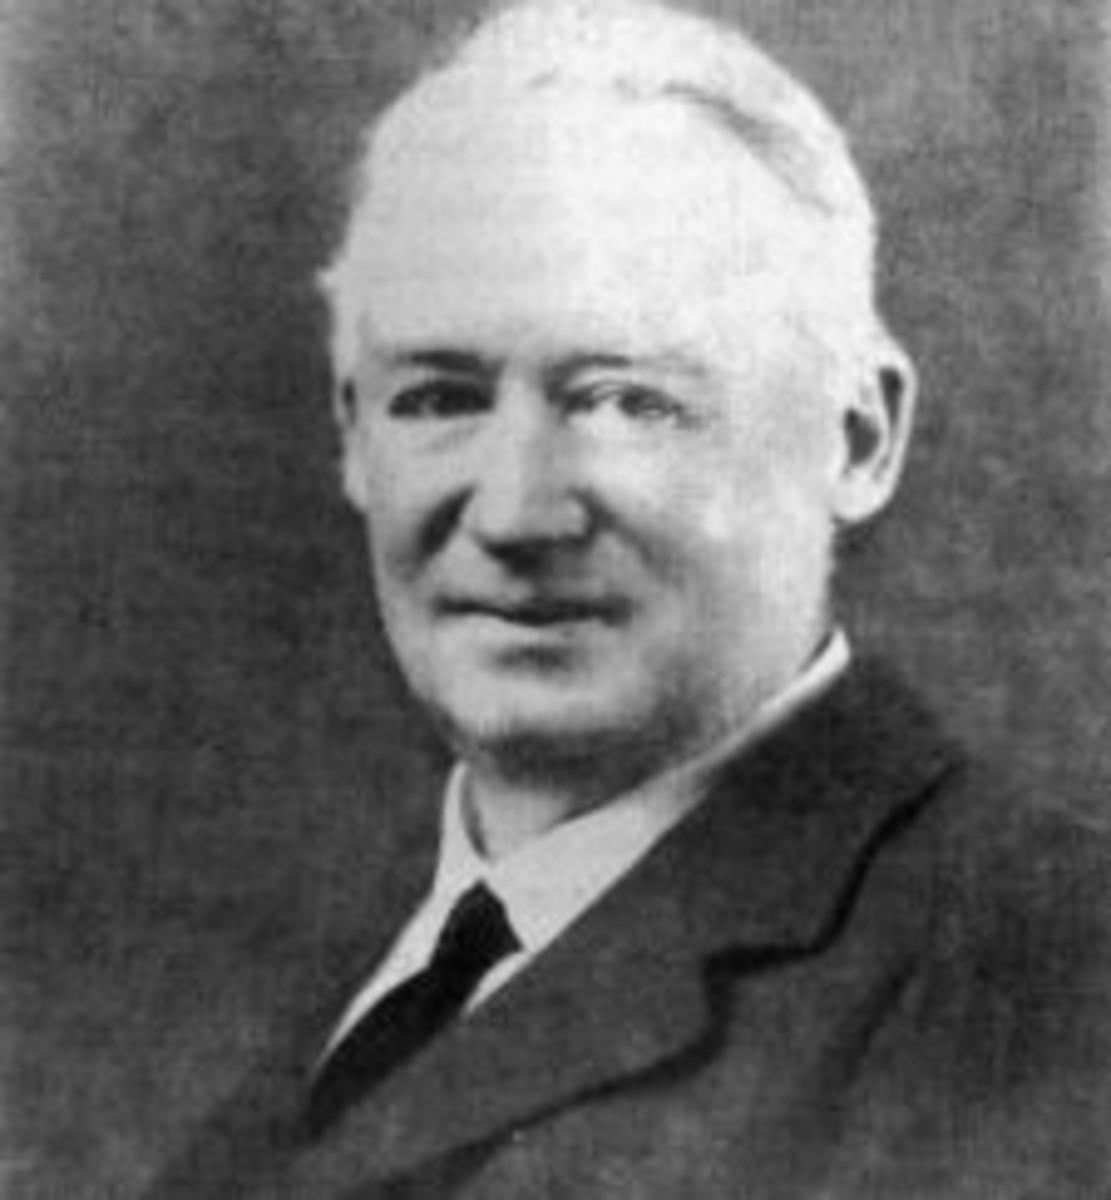 Sir Percy Fitzpatrick